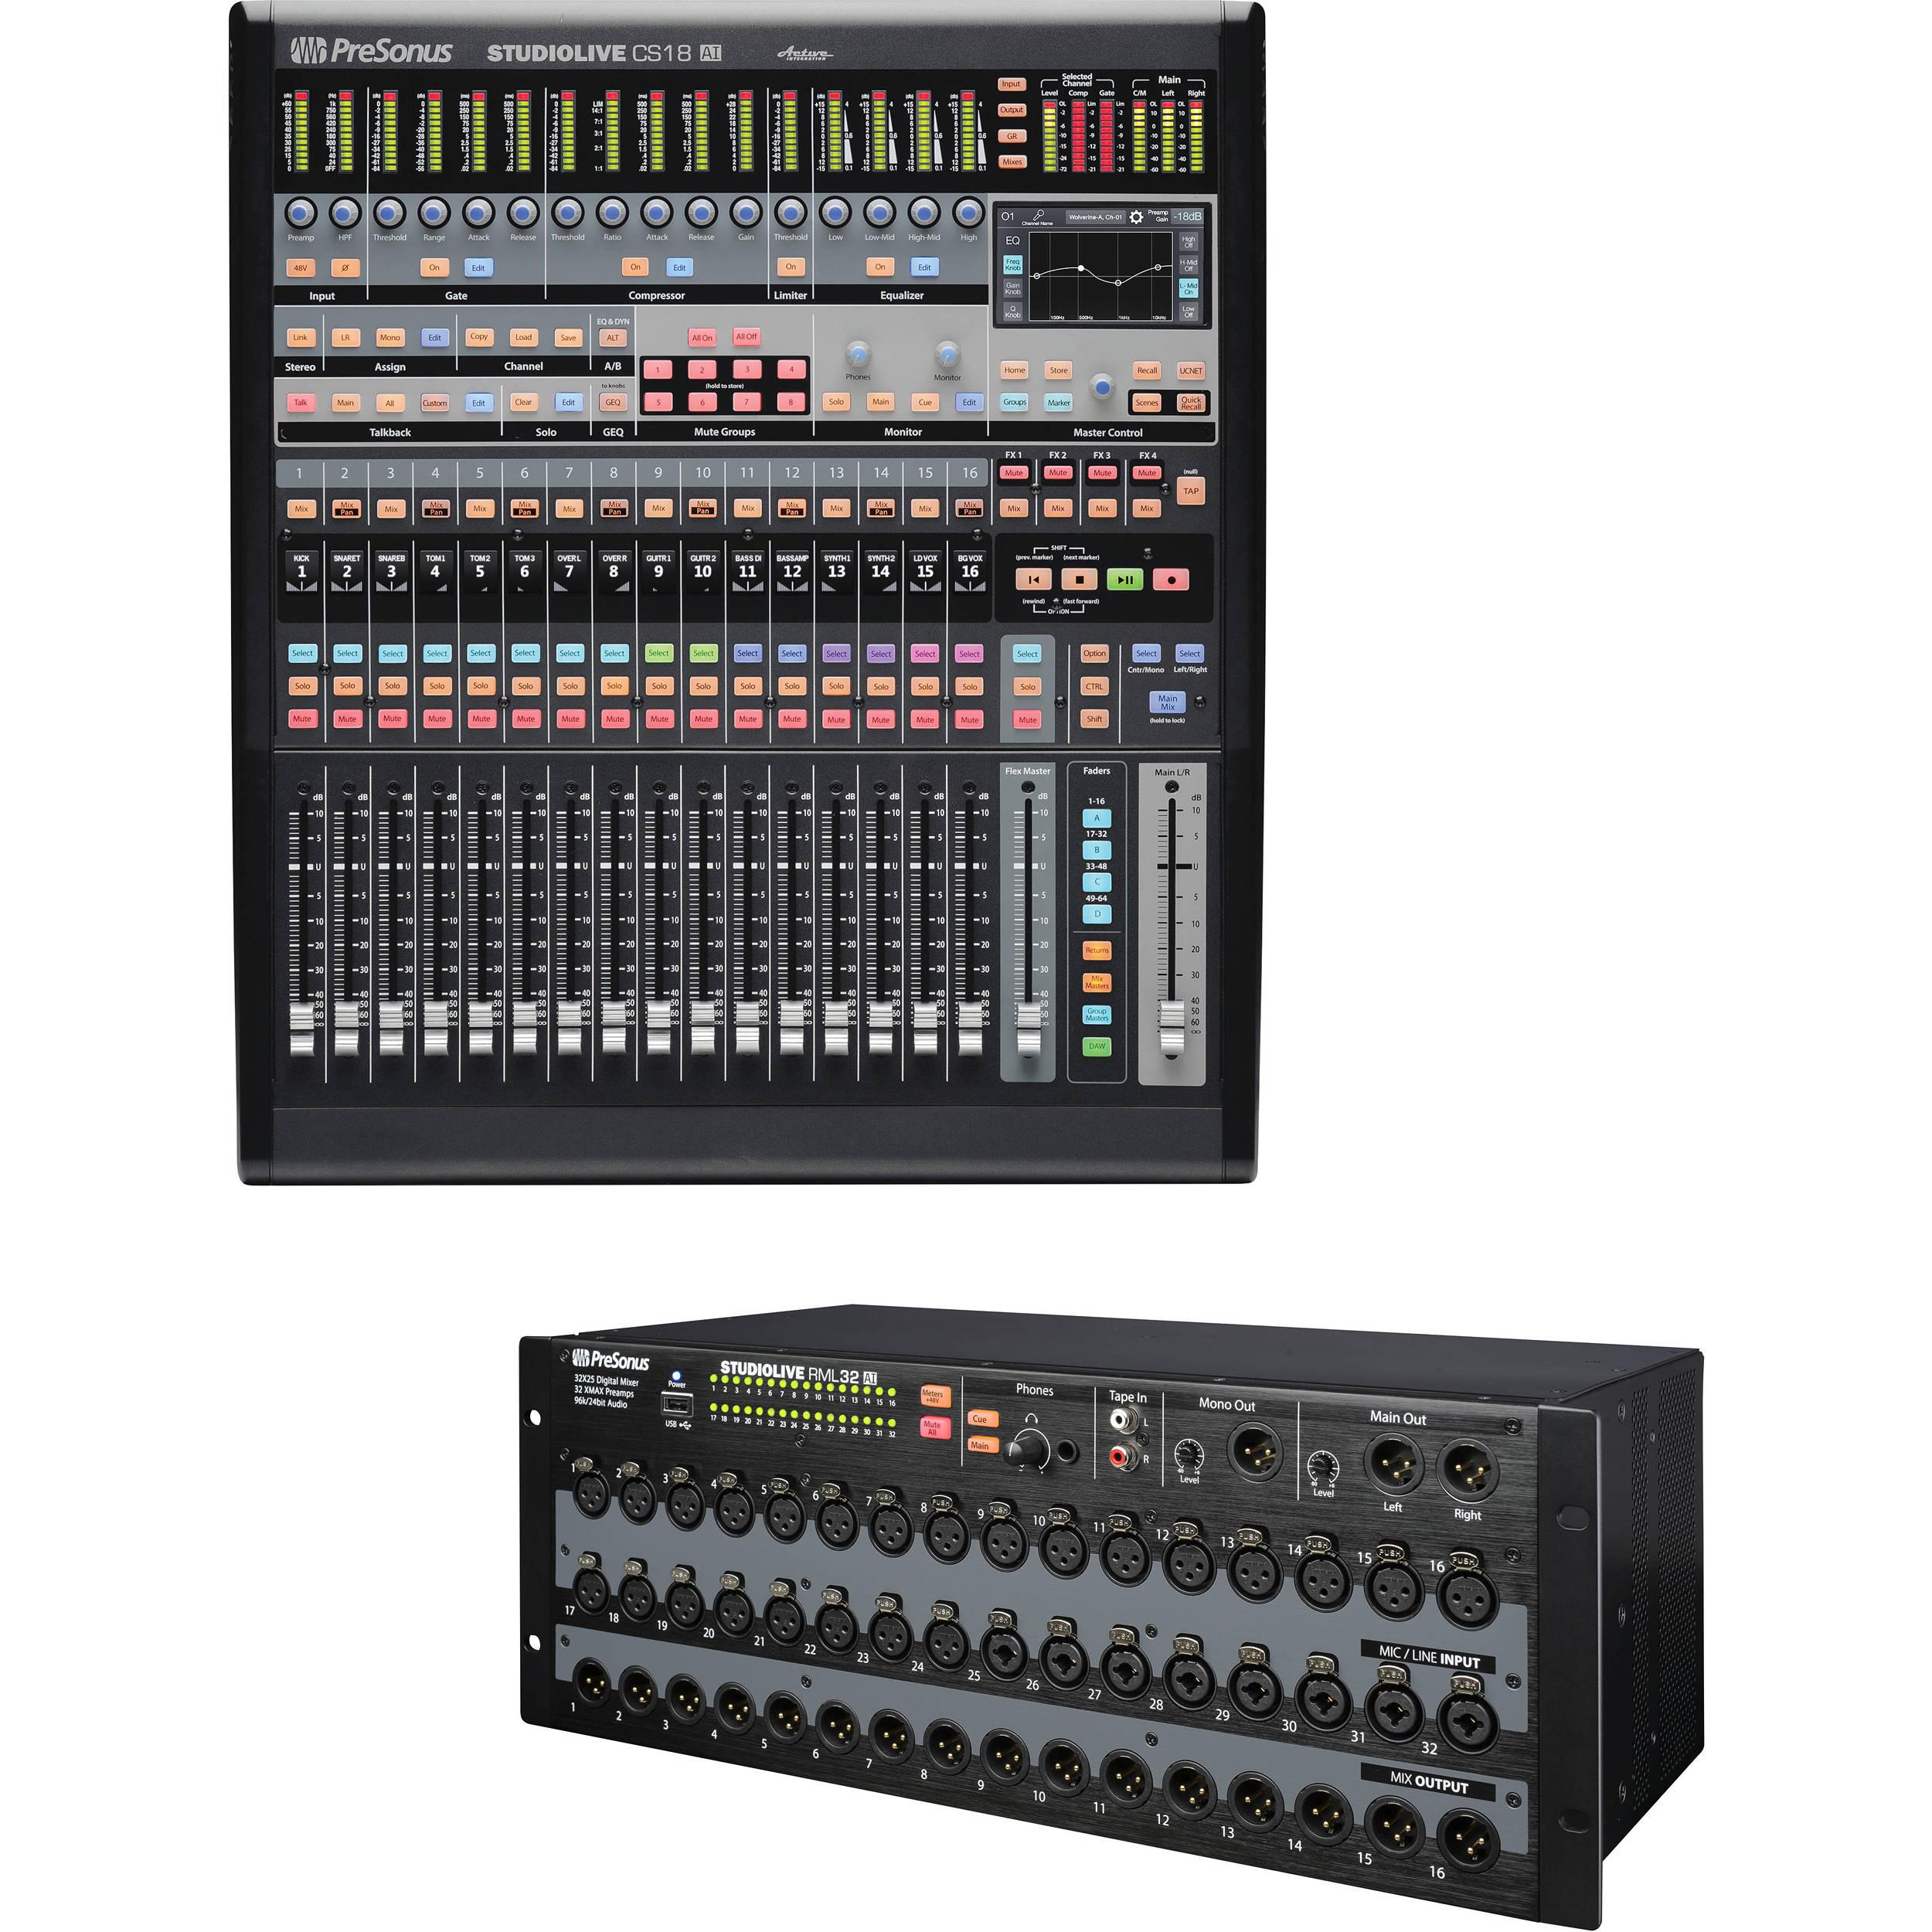 Presonus Control Surface : presonus rml32ai mixer kit with cs18ai control surface b h photo ~ Hamham.info Haus und Dekorationen